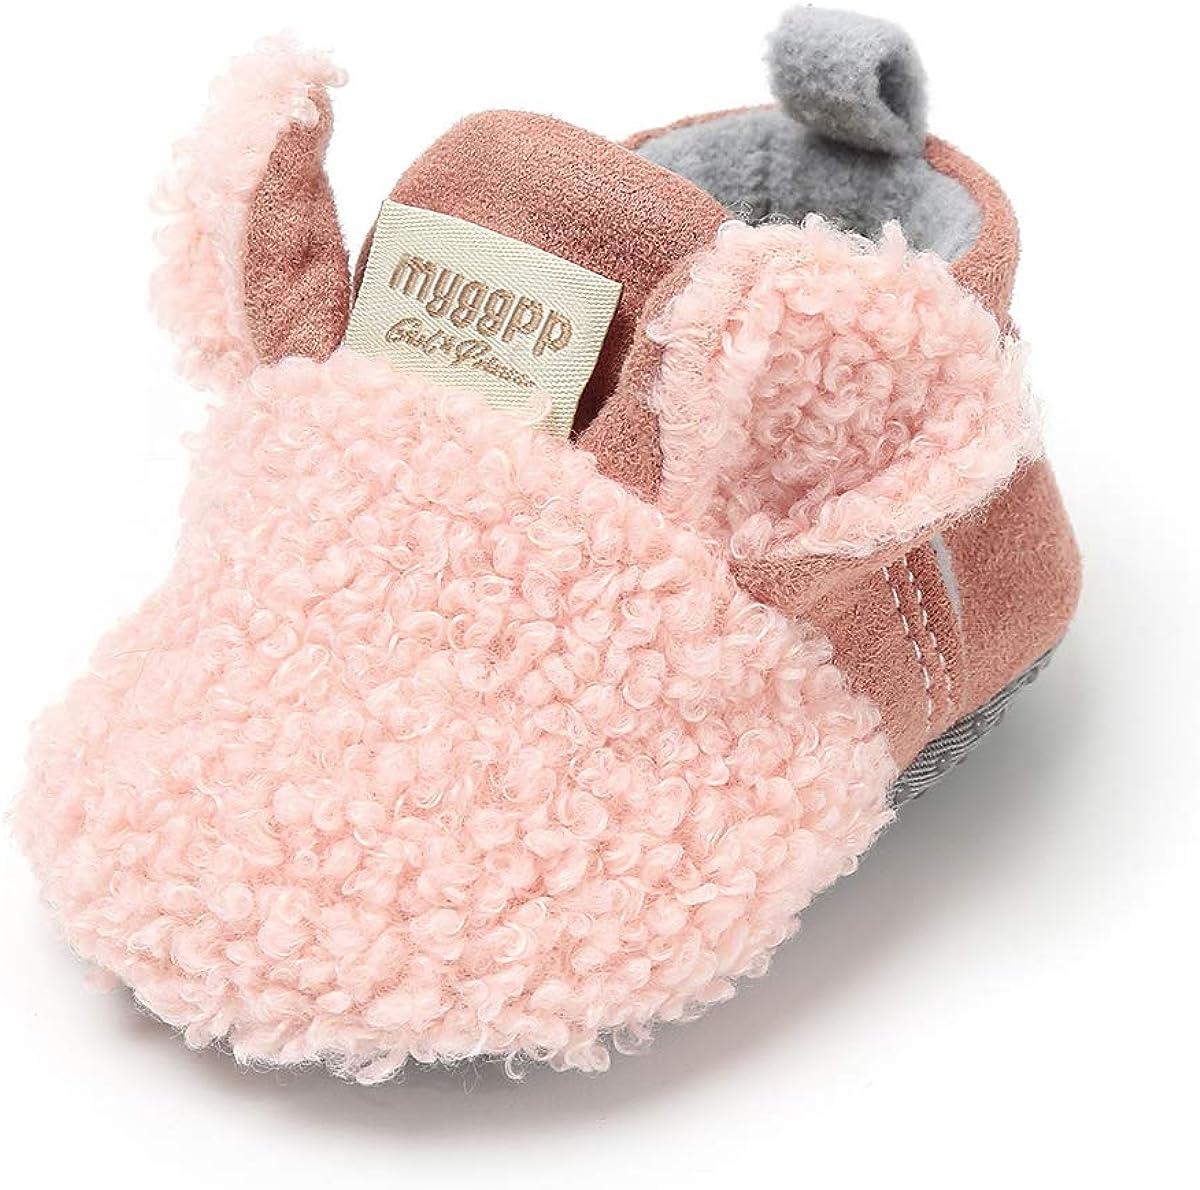 Sakuracan Infant Baby Boys Girls Slippers Non Slips Bottom Winter Booties Stay On Newborn Crib House Shoes